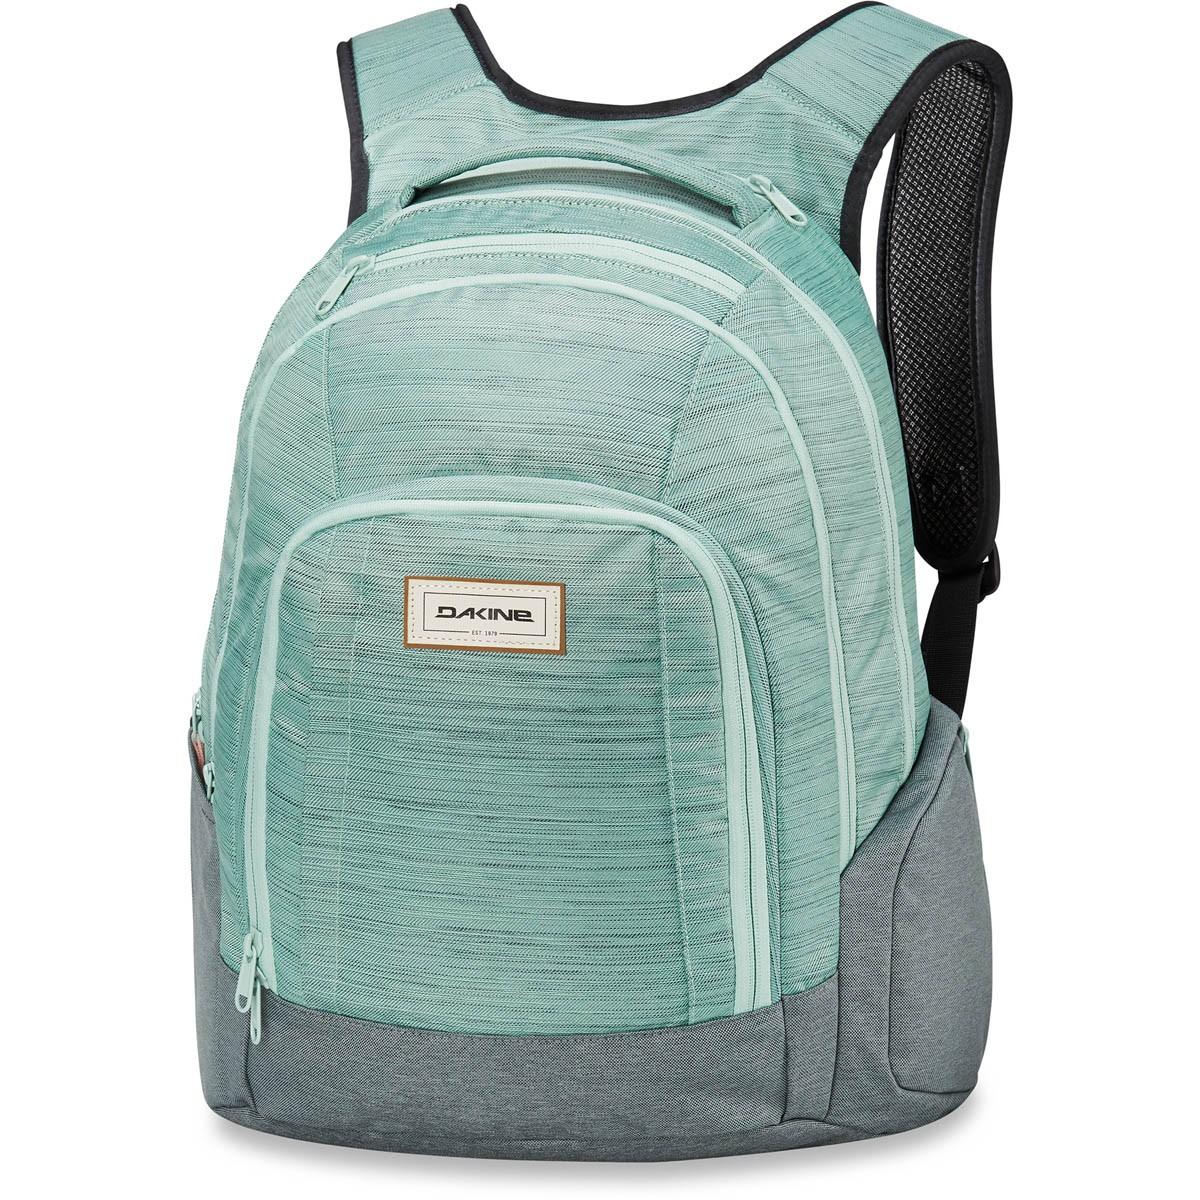 d2d59600a39f0 Dakine Frankie 26L Backpack Brighton